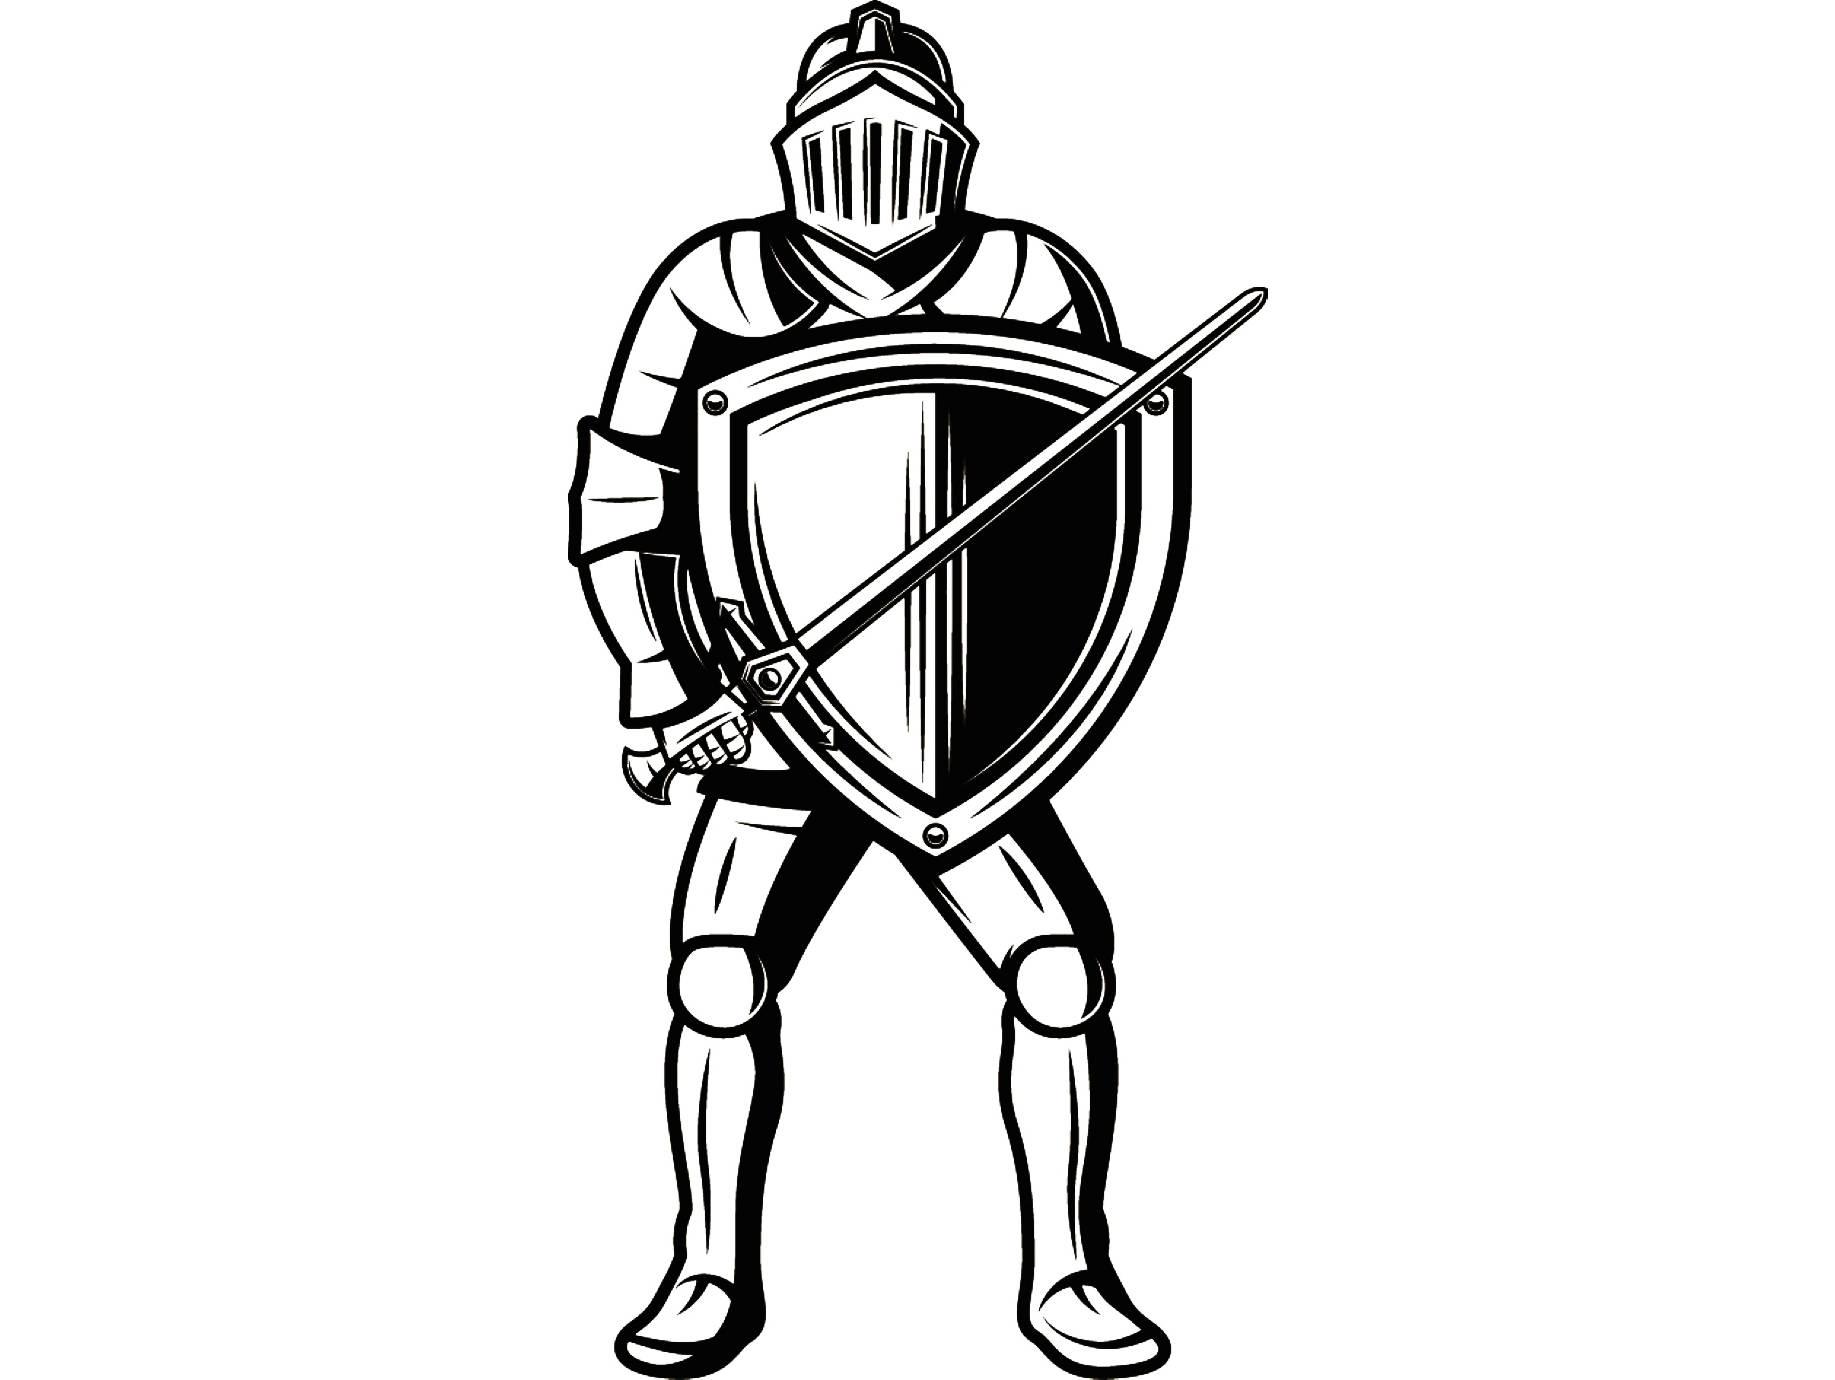 1835x1380 Knight 1 Metal Armor Helmet Sword Shield Monarch Military